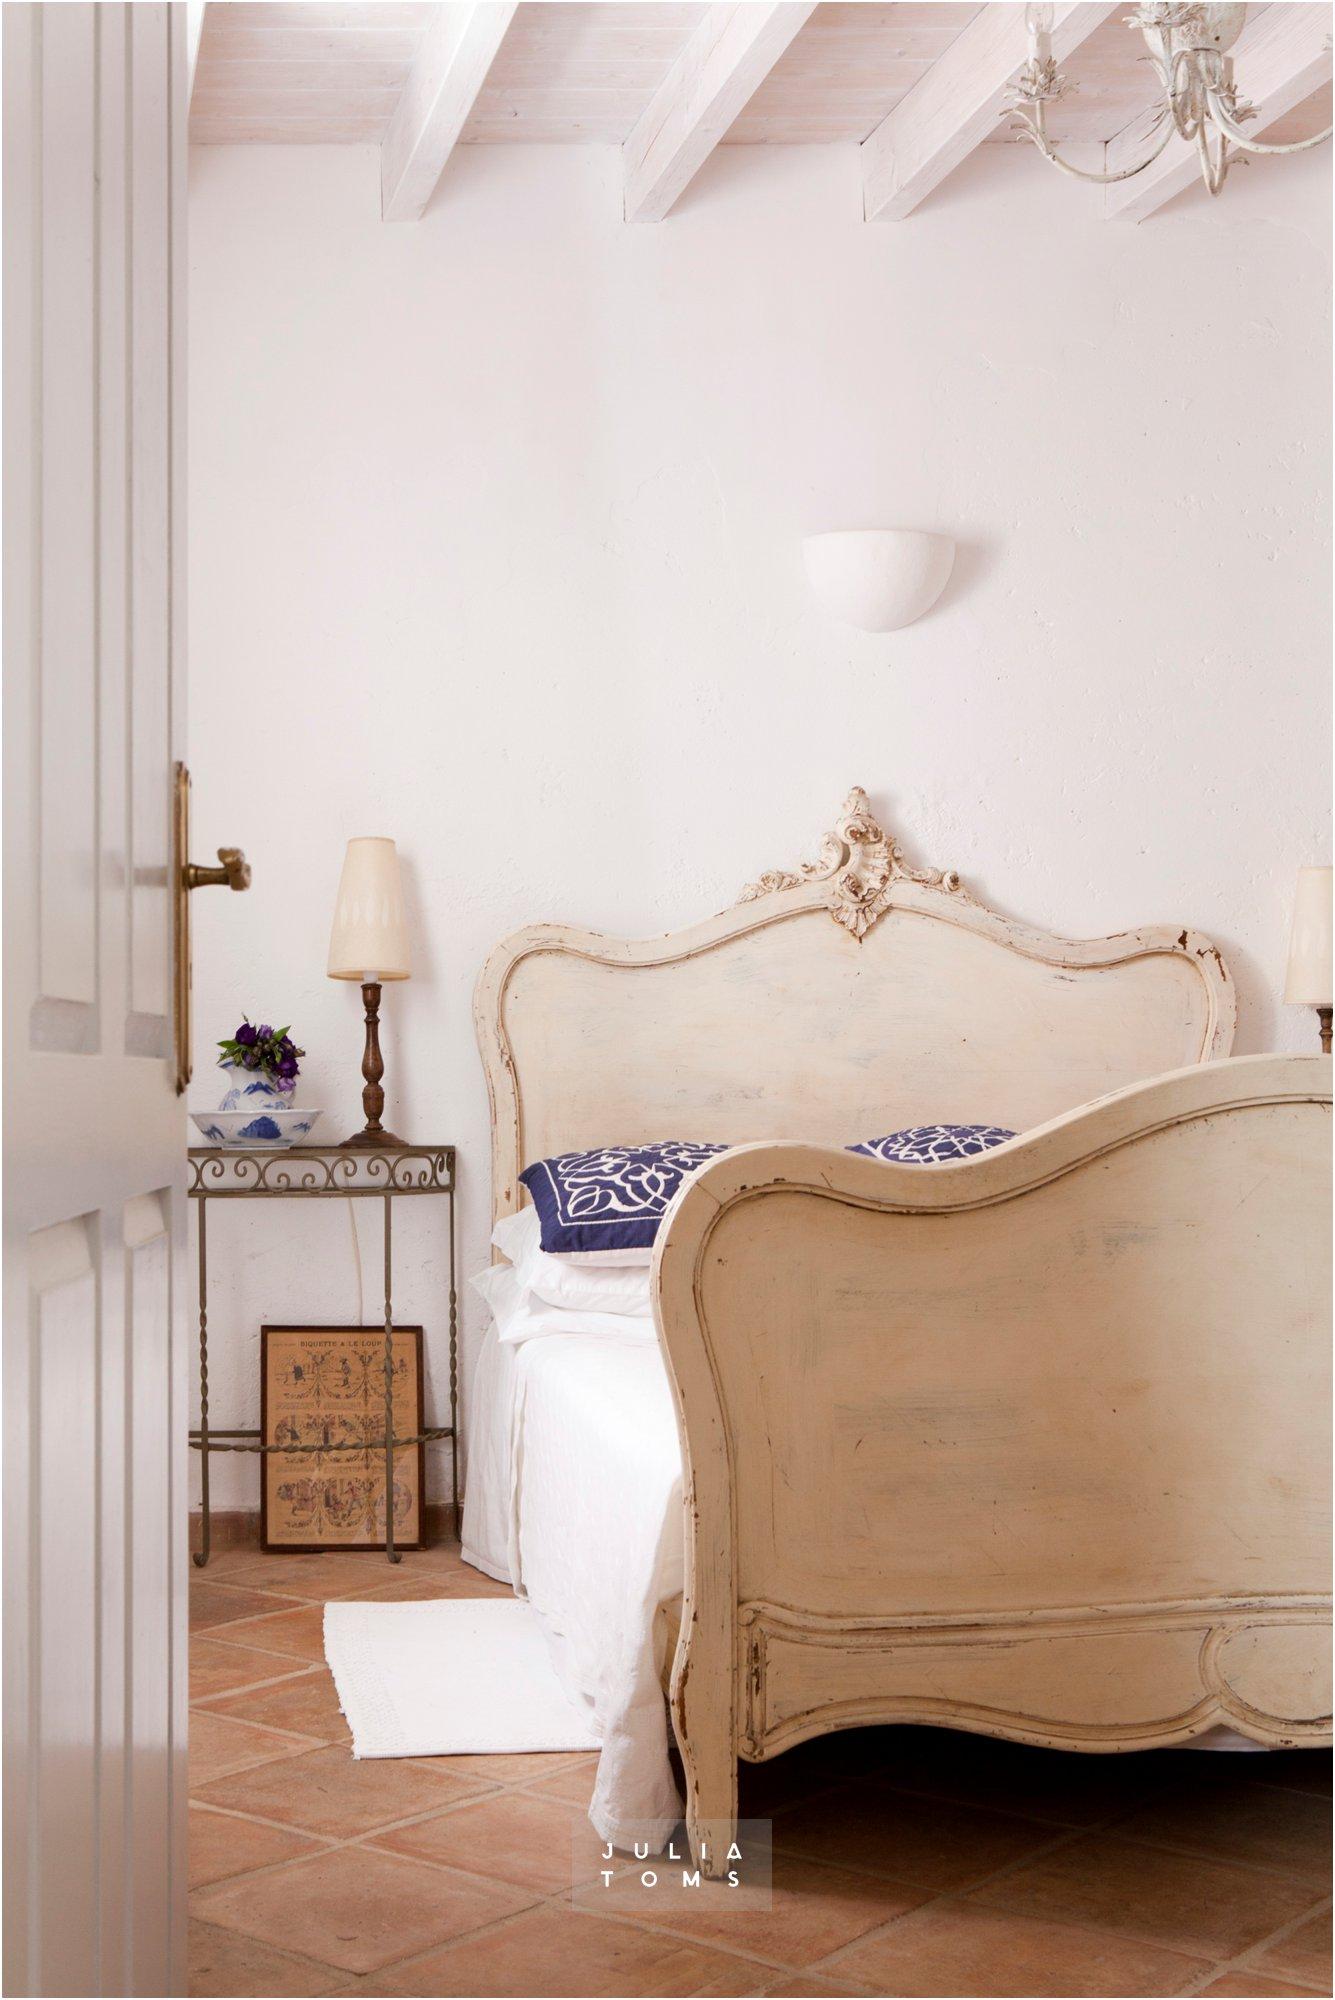 julia_toms_photography_interiors_magazine_012.jpg